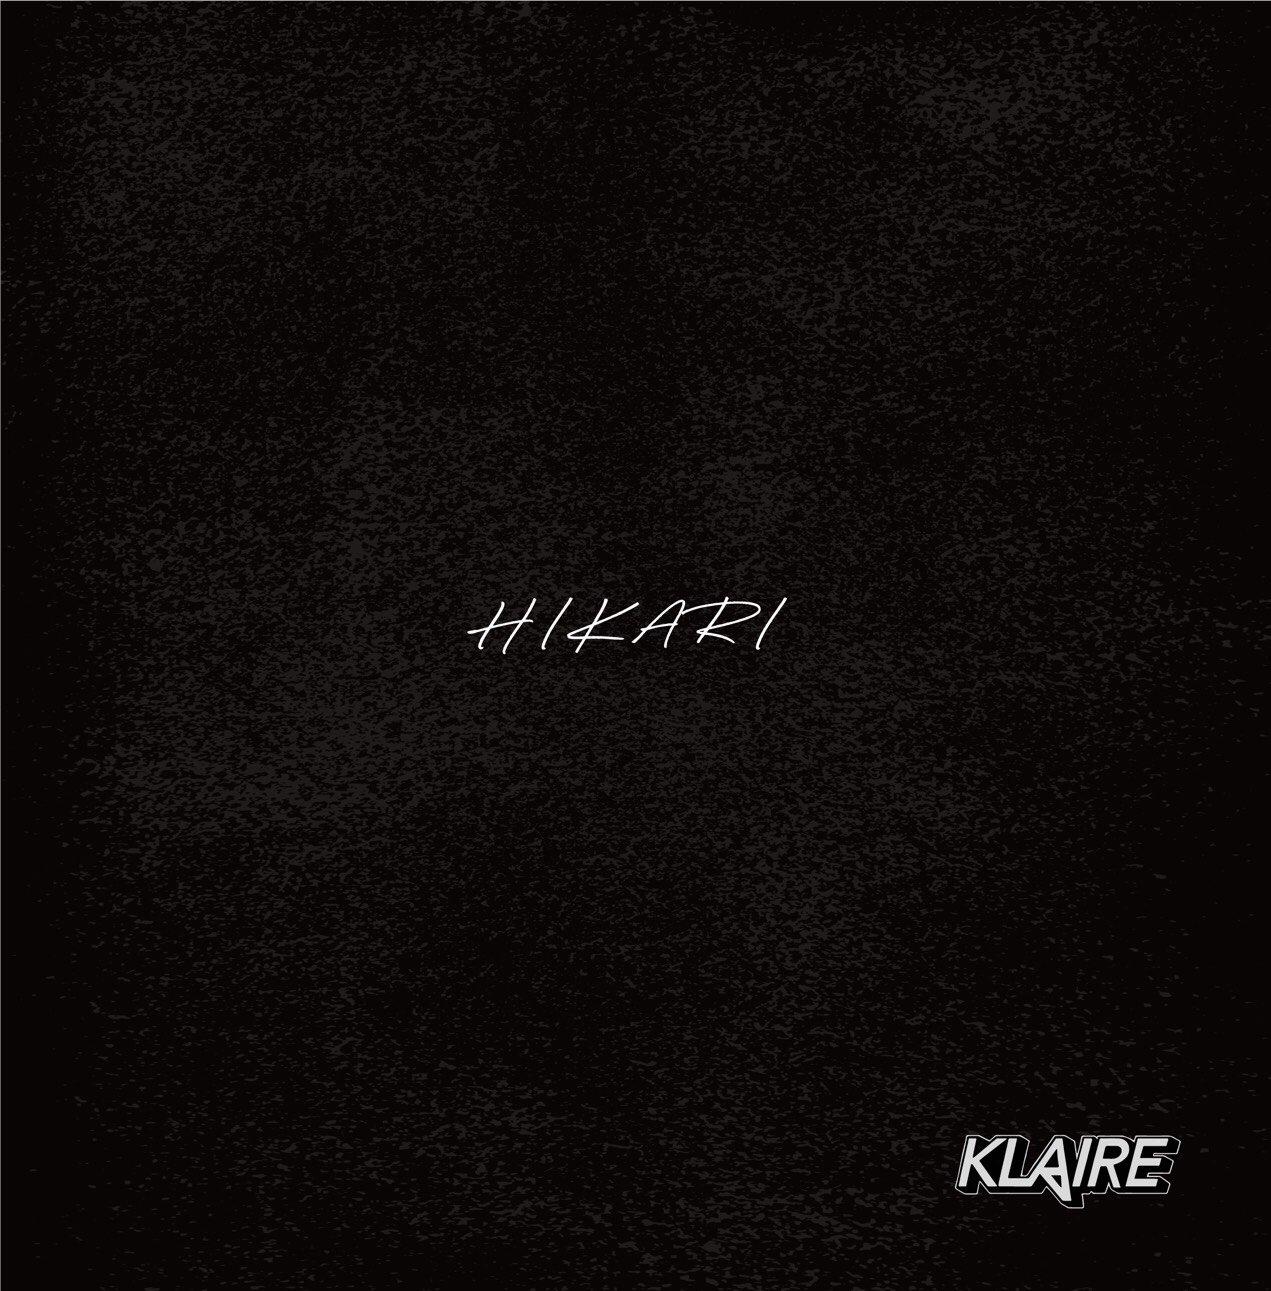 HIKARI (KLAIRE)